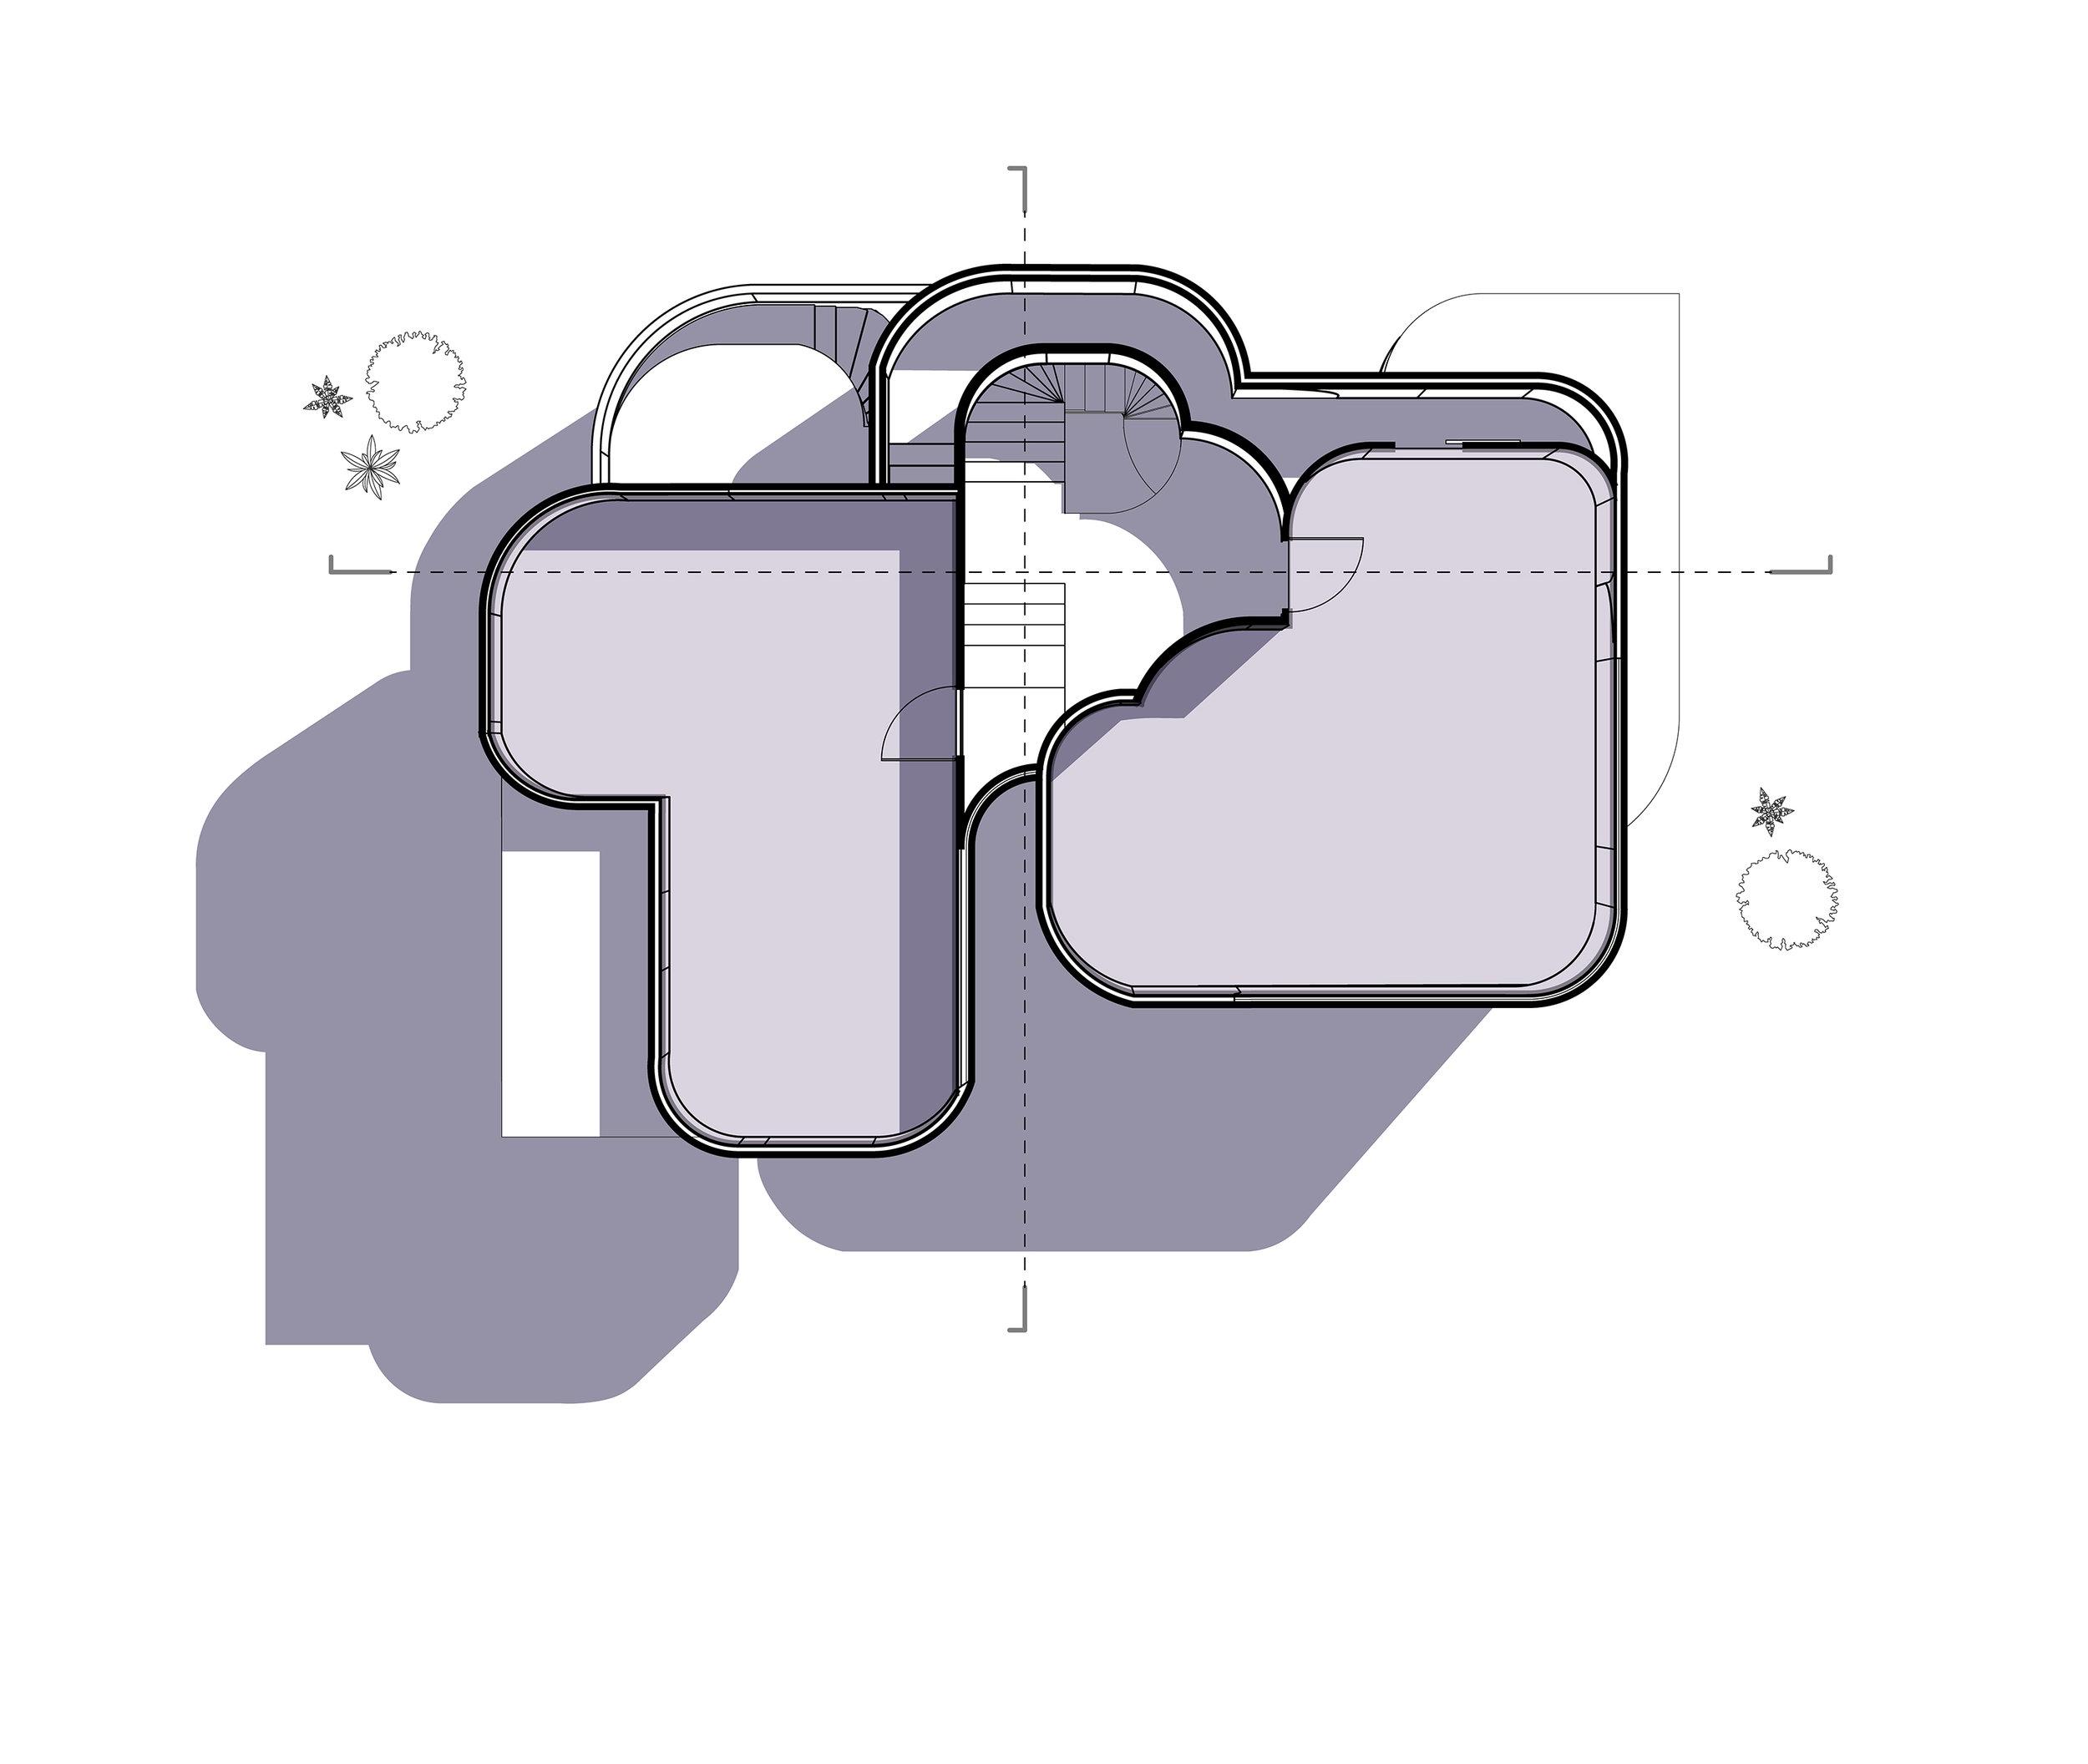 plan02.5.jpg